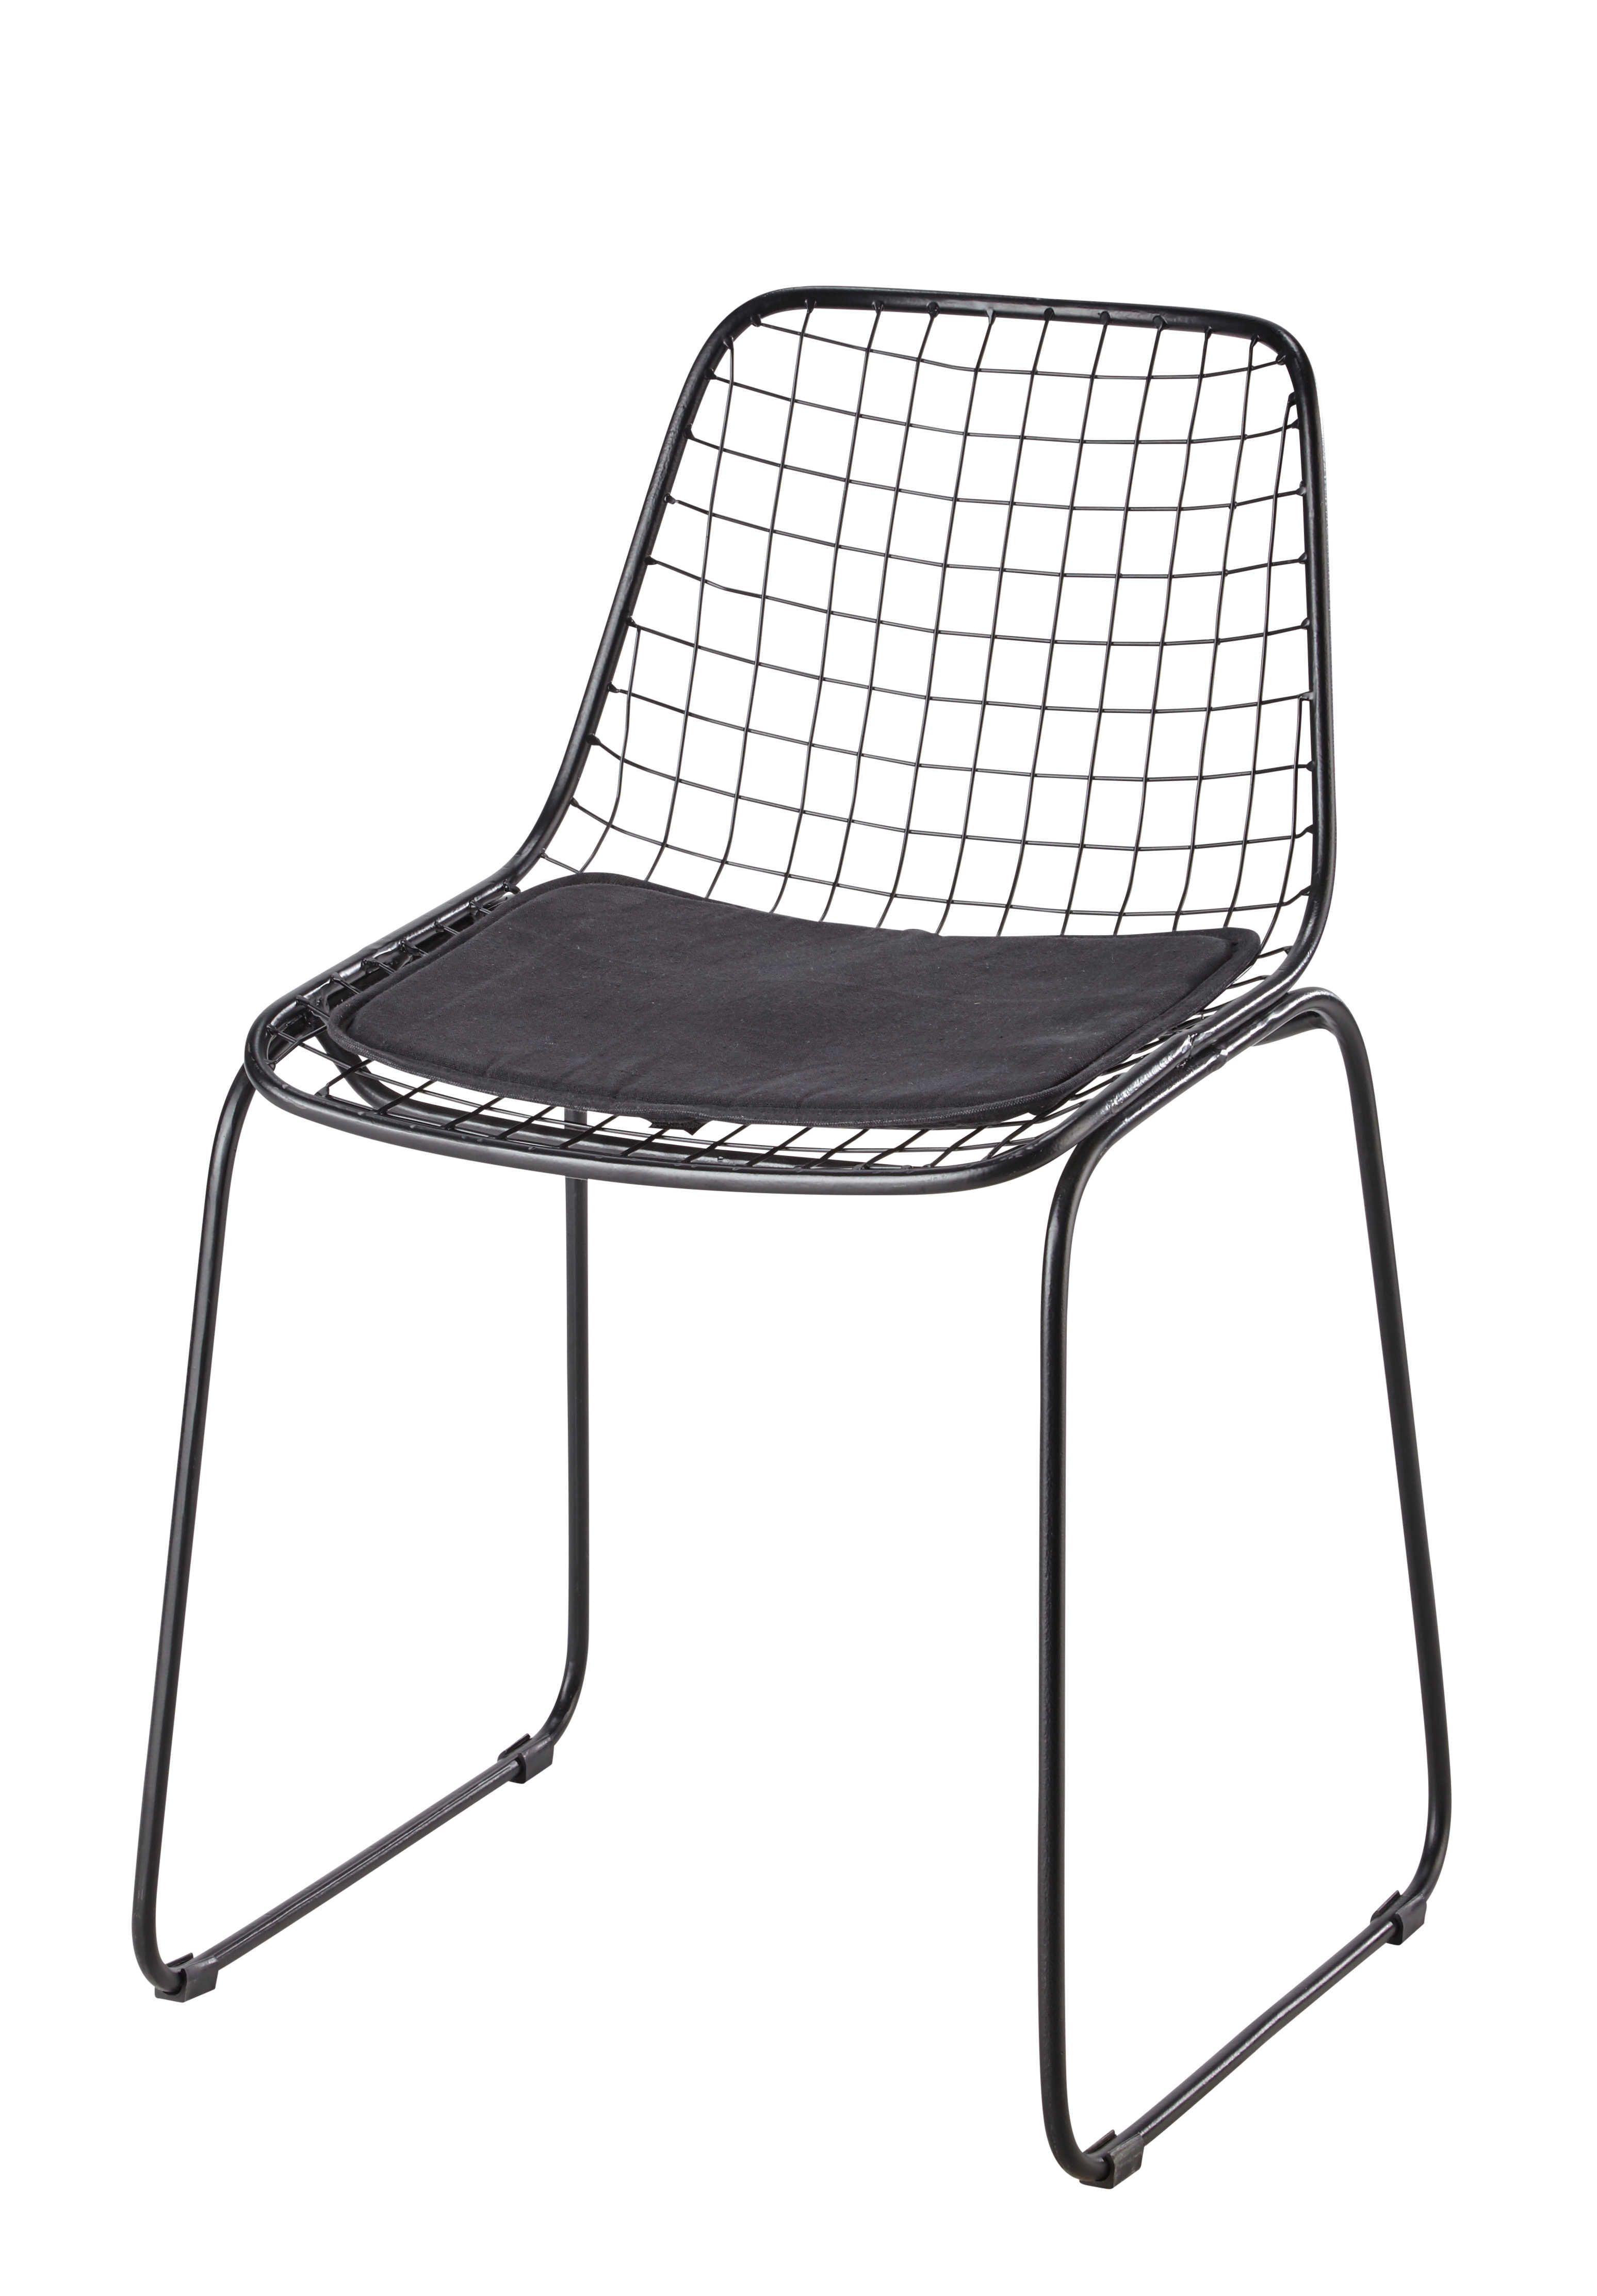 Metal Chair In Black Picpus